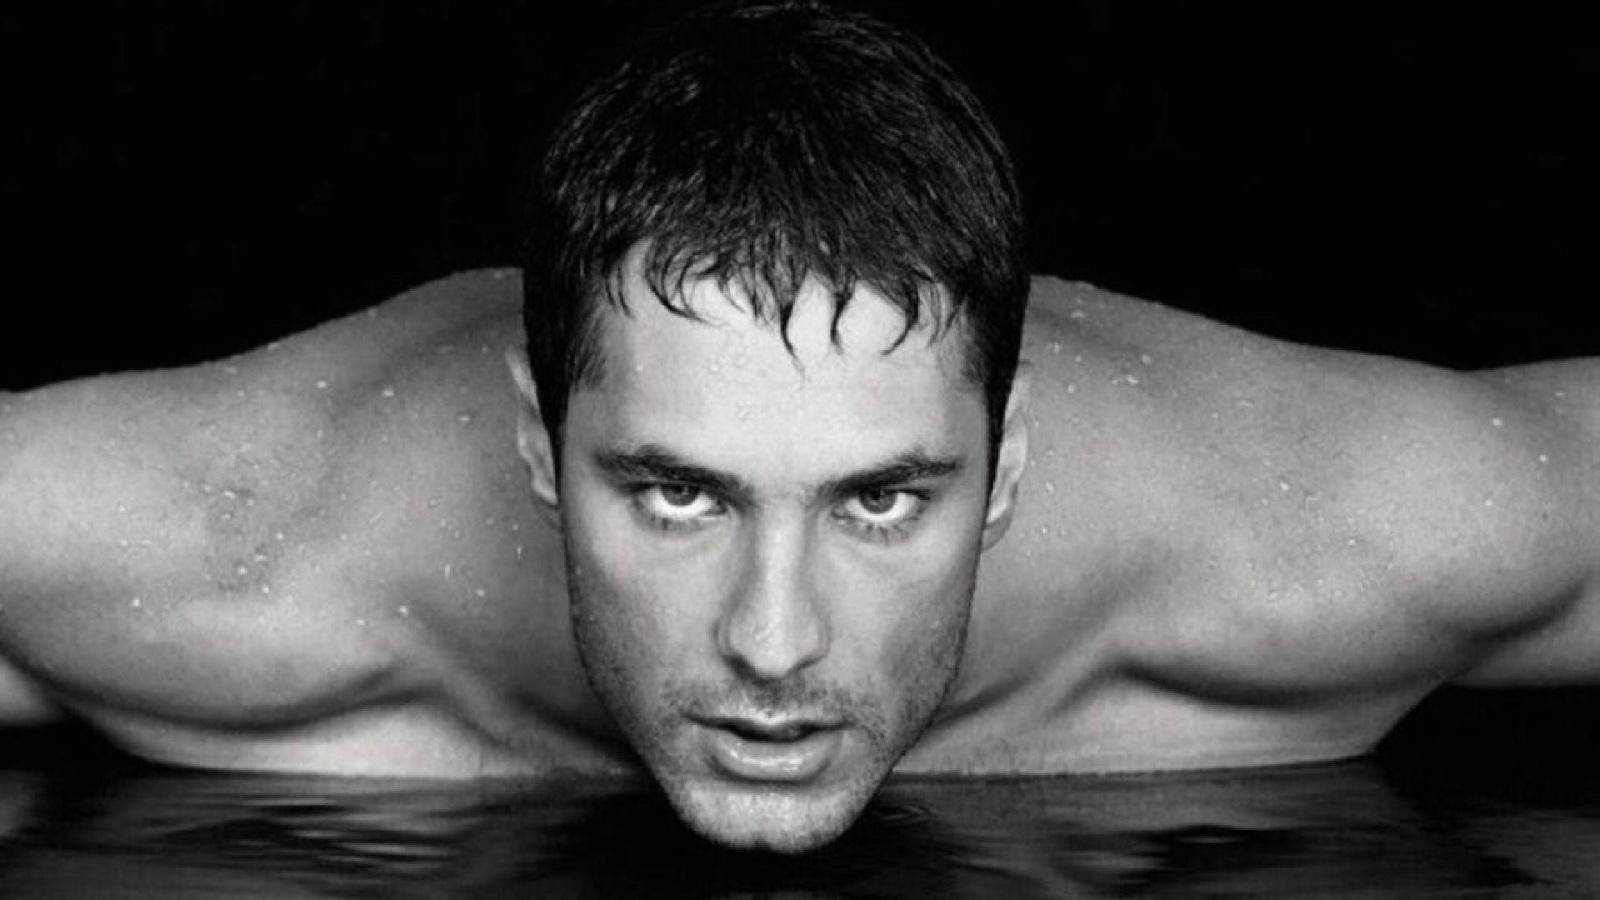 Amore Nero Raoul Bova raoul bova - Поиск в google   people with style.   uomini